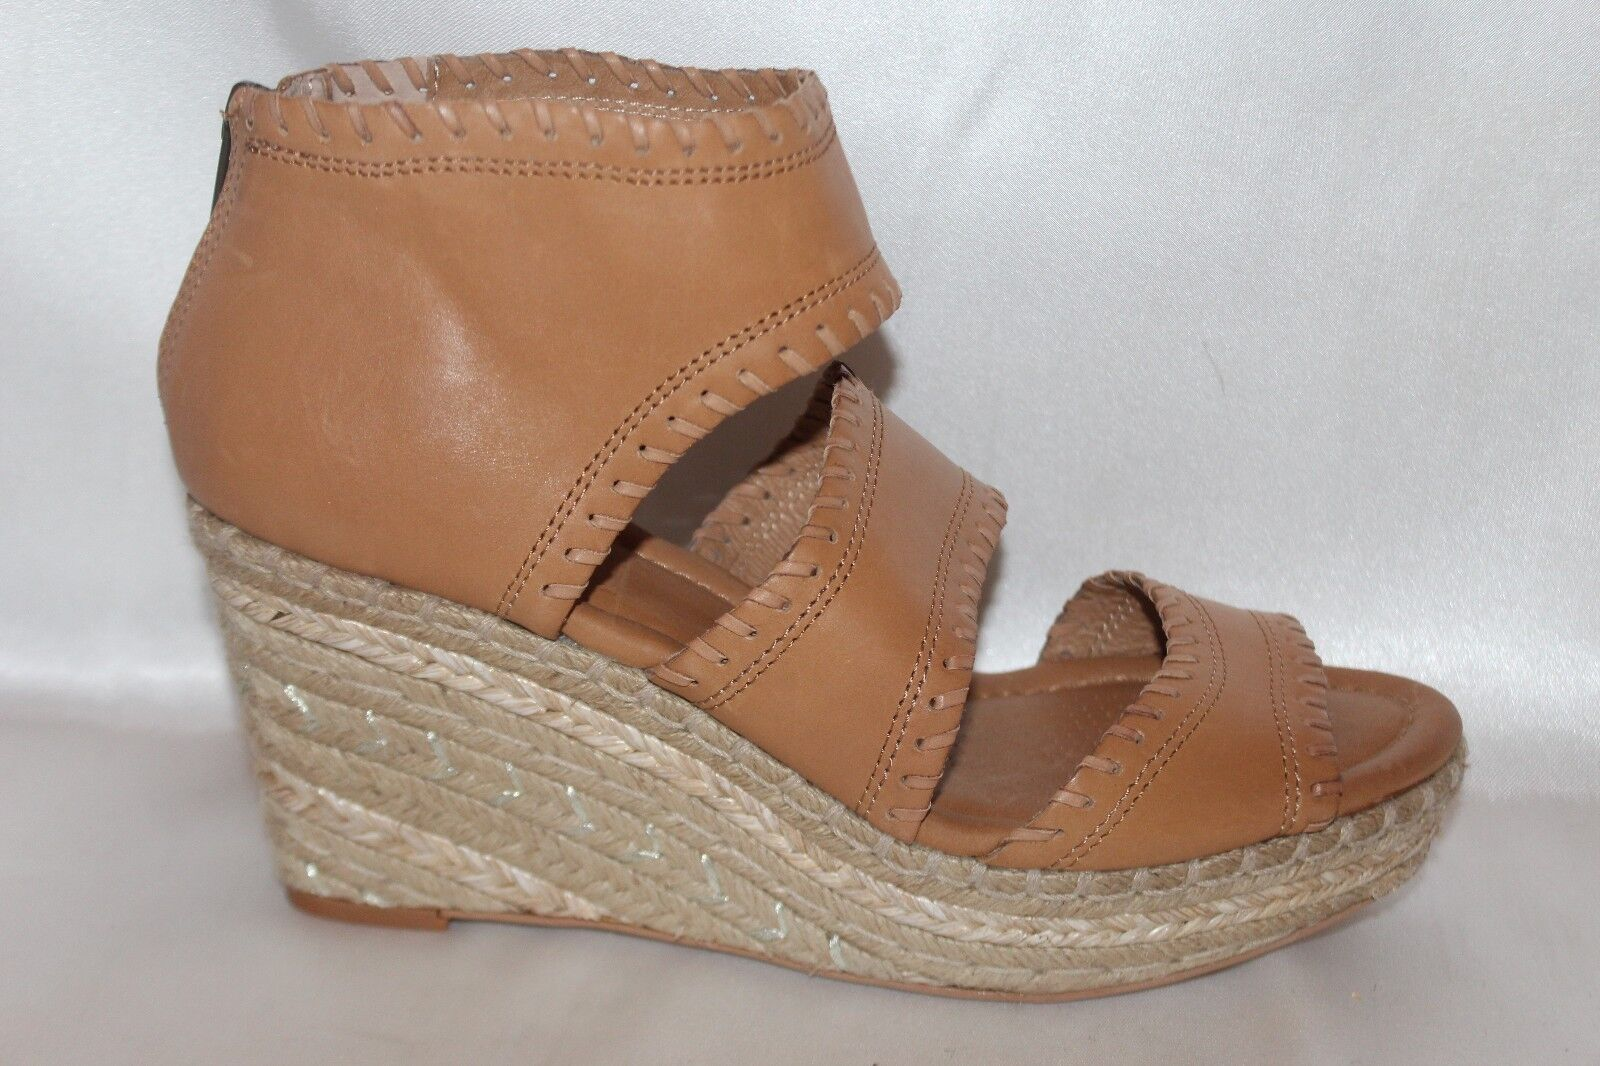 NEW CORSO CORSO CORSO COMO Camel Leather JOYCE Jute Open Toe Wedge Platform Sandal 8.5  169 45dd9f